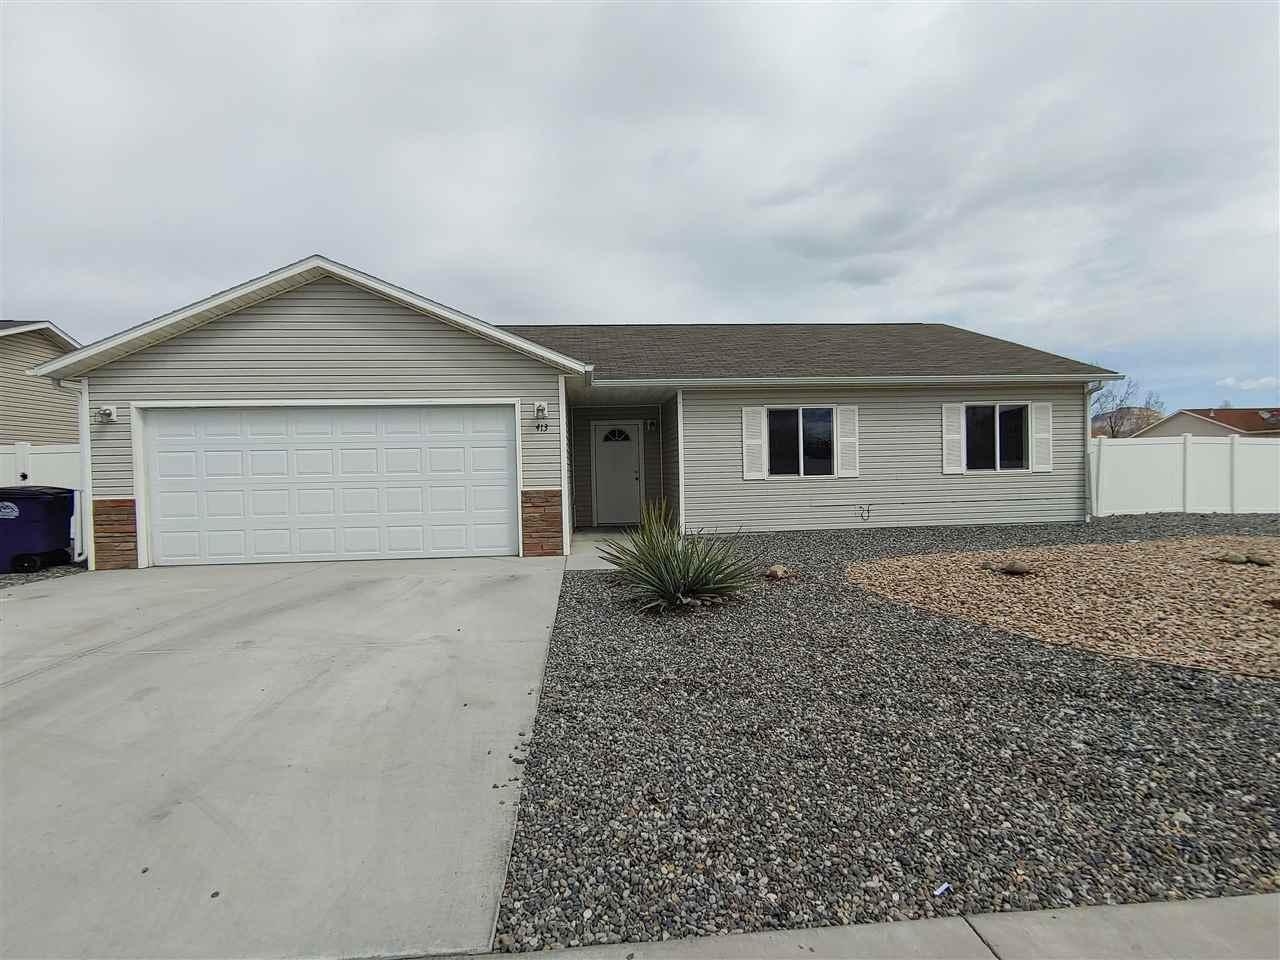 413 Allison Way, Grand Junction, CO 81504